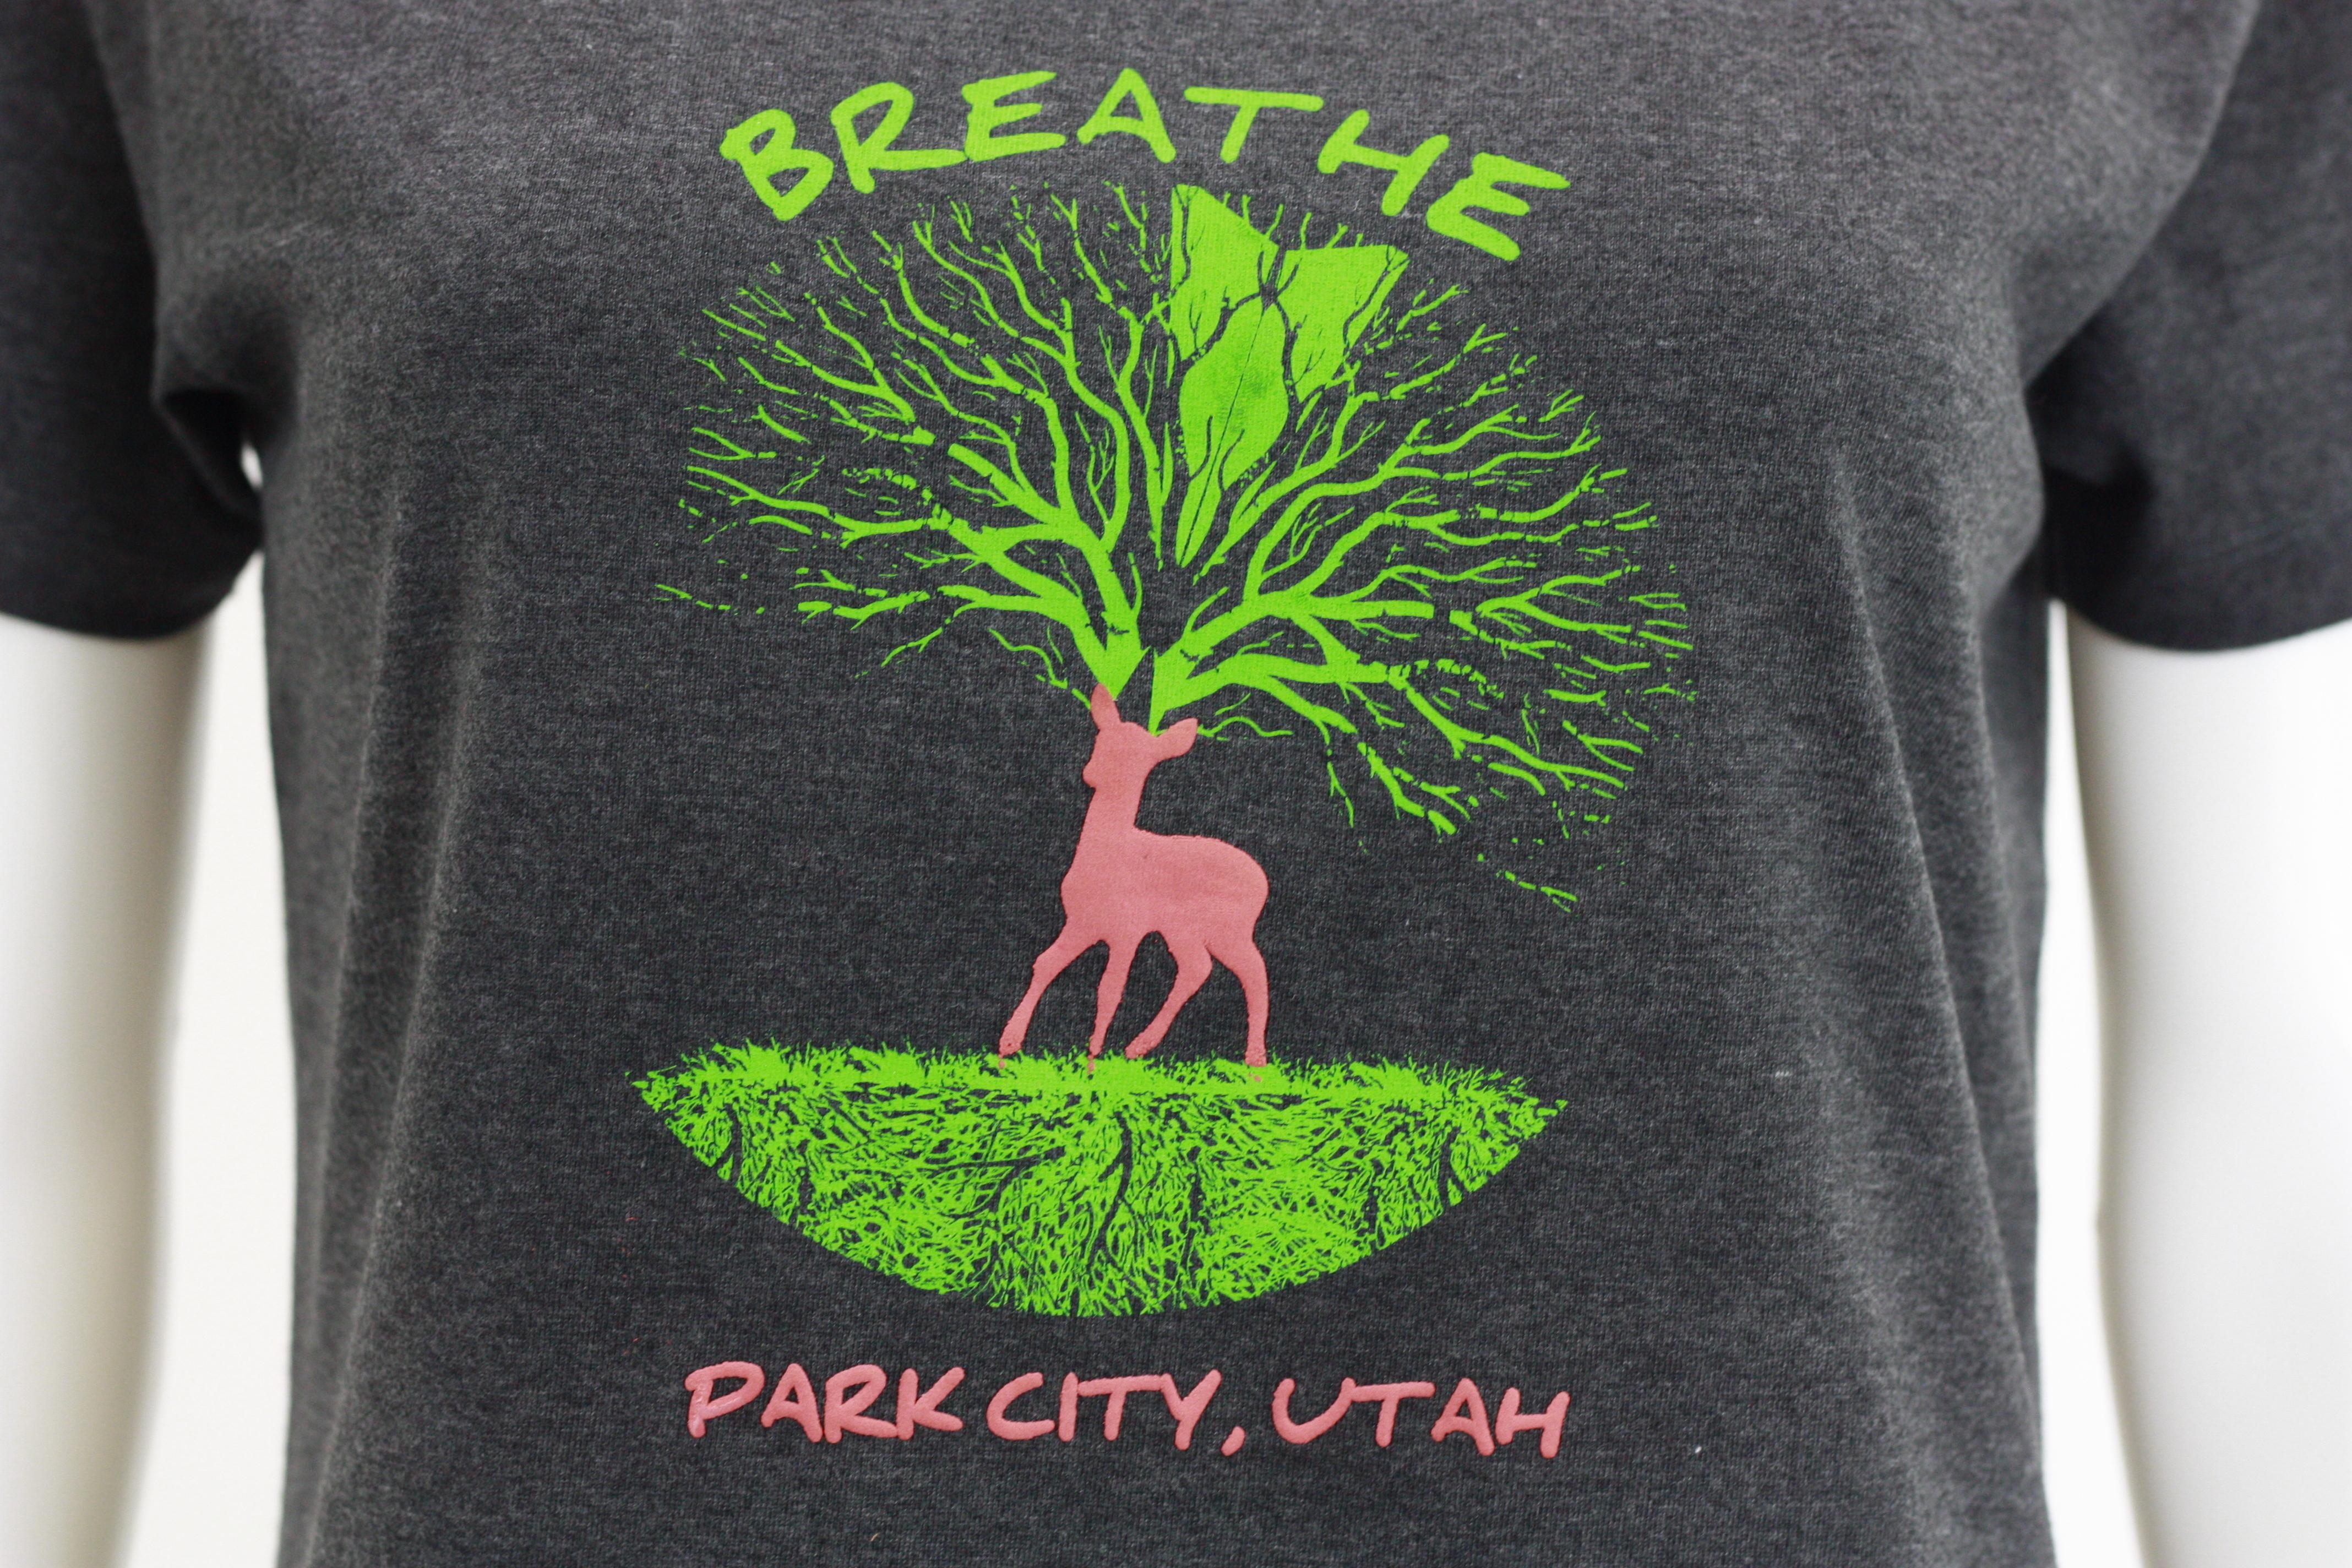 Breathe charcoal tee